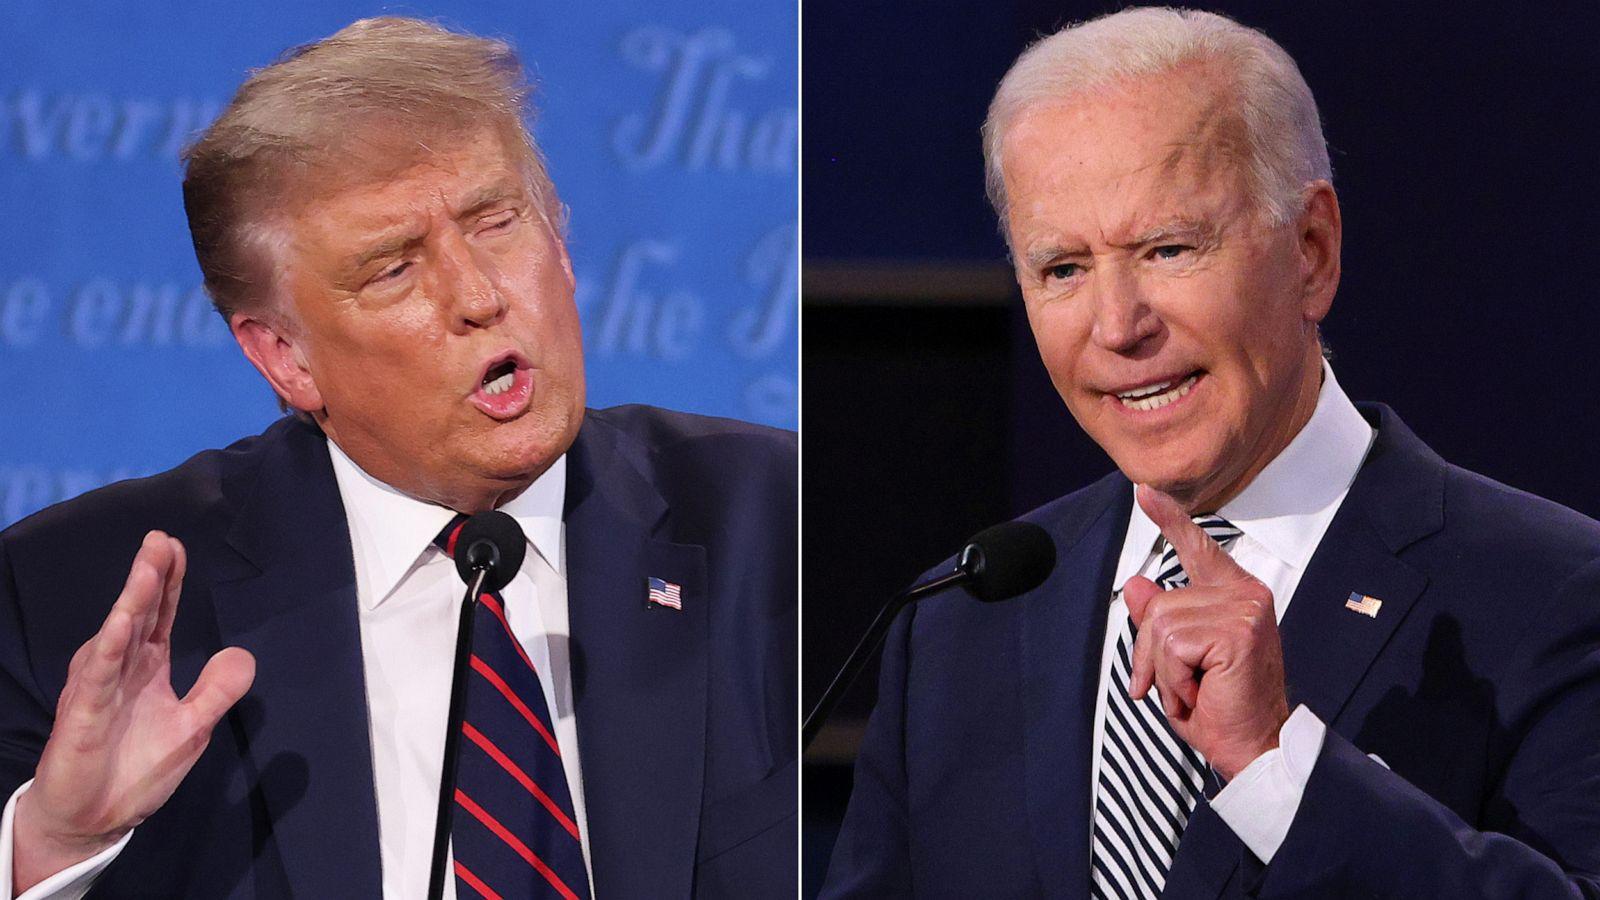 1st presidential debate between Trump and Biden spirals into chaotic clash